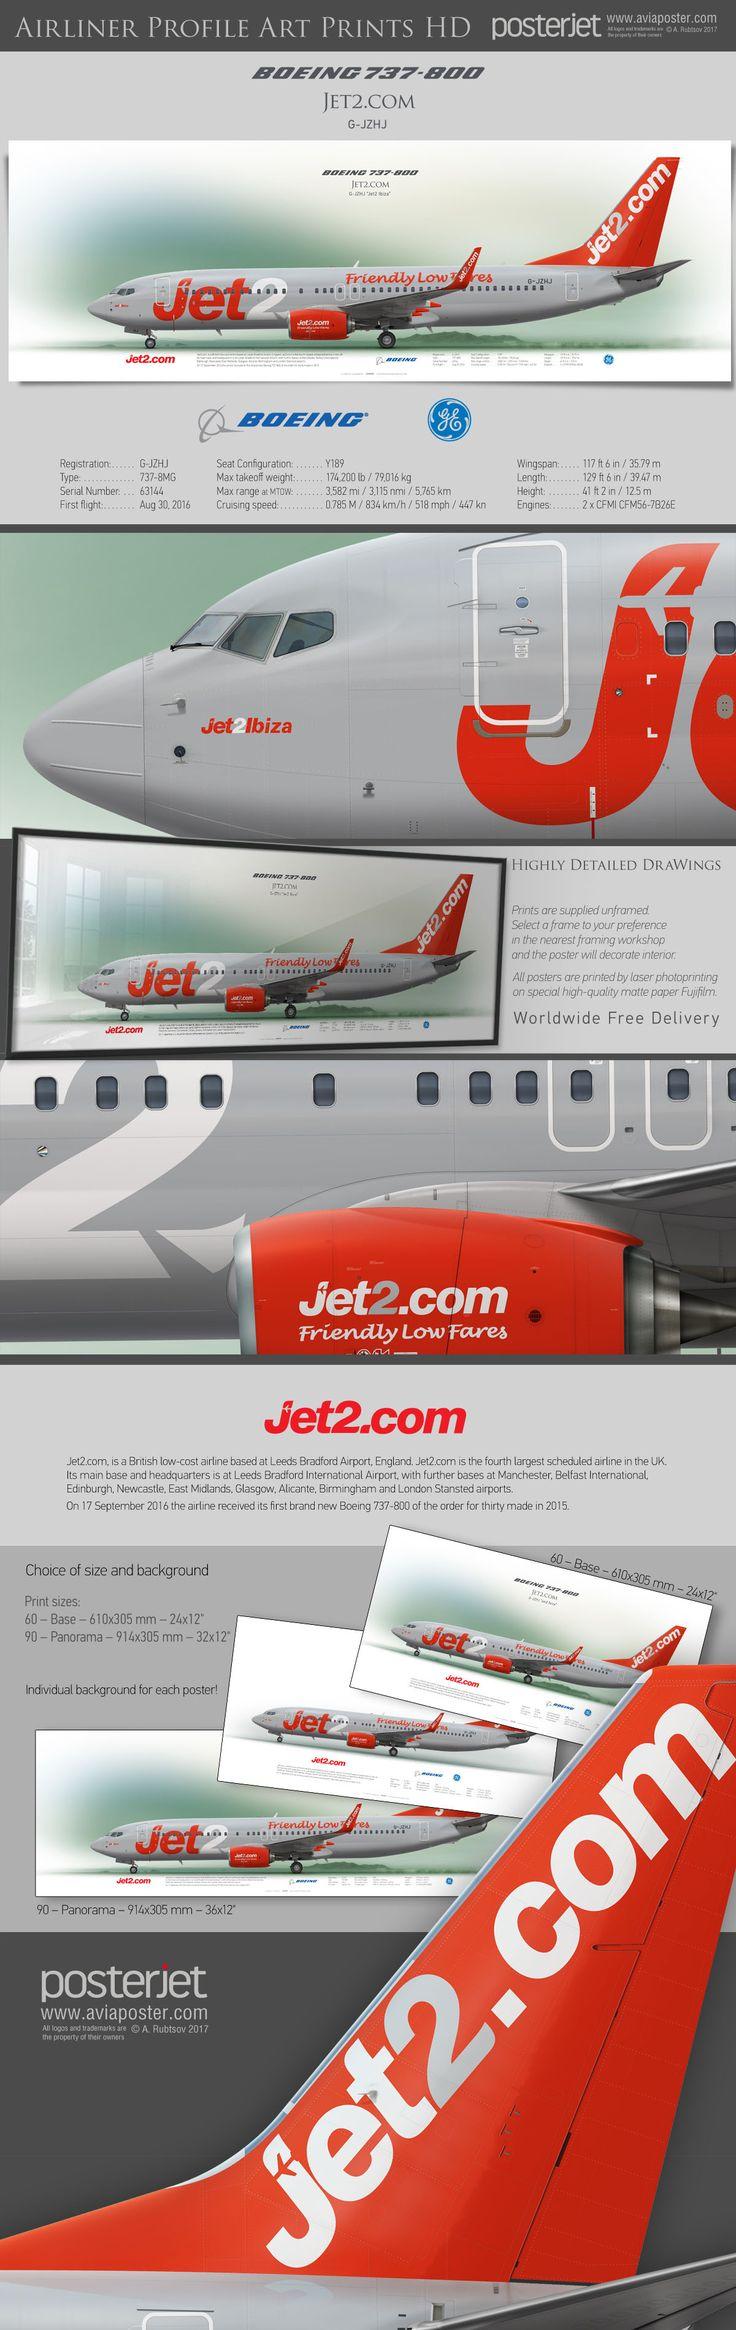 Boeing 737-800 Jet2.com G-JZHJ | www.aviaposter.com | #airliners #aviation #jetliner #airplane #pilot #aviationlovers #avgeek #jet #airport #pilotlife #cabincrew #boeinglovers #boeingpilot #boeingscrew #b737